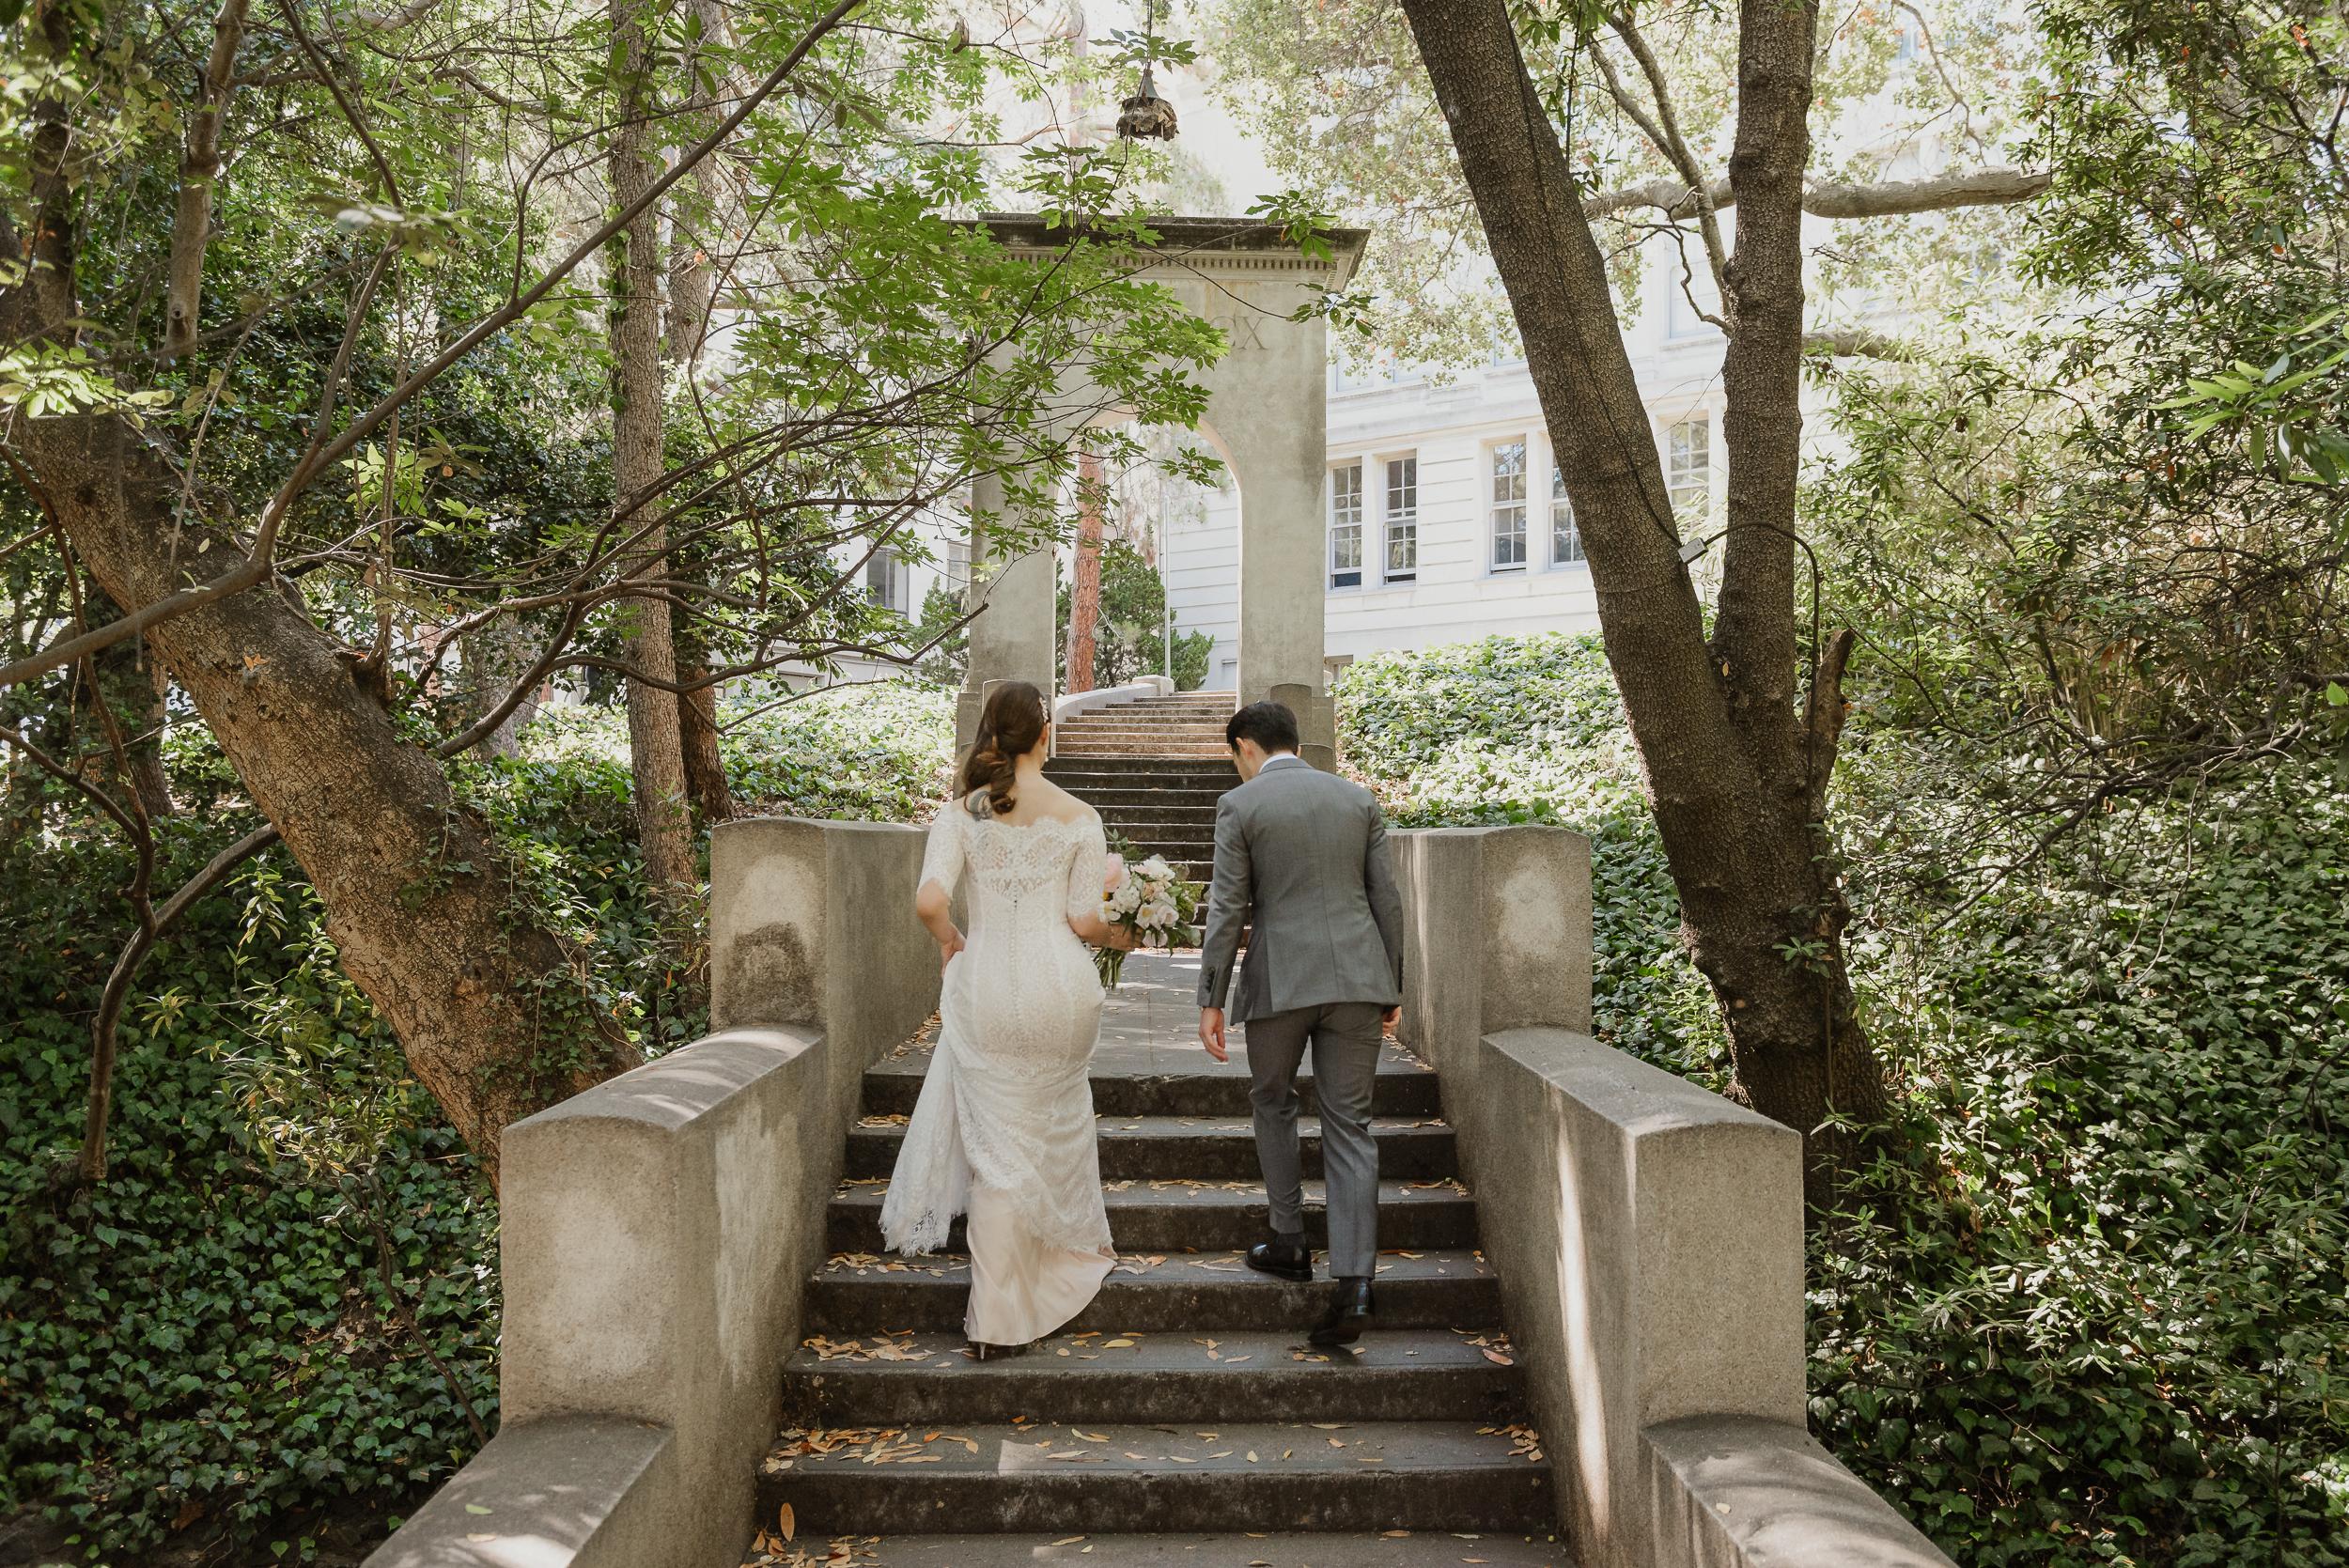 20-berkeley-uc-faculty-club-wedding-kb-vivianchen-164.jpg